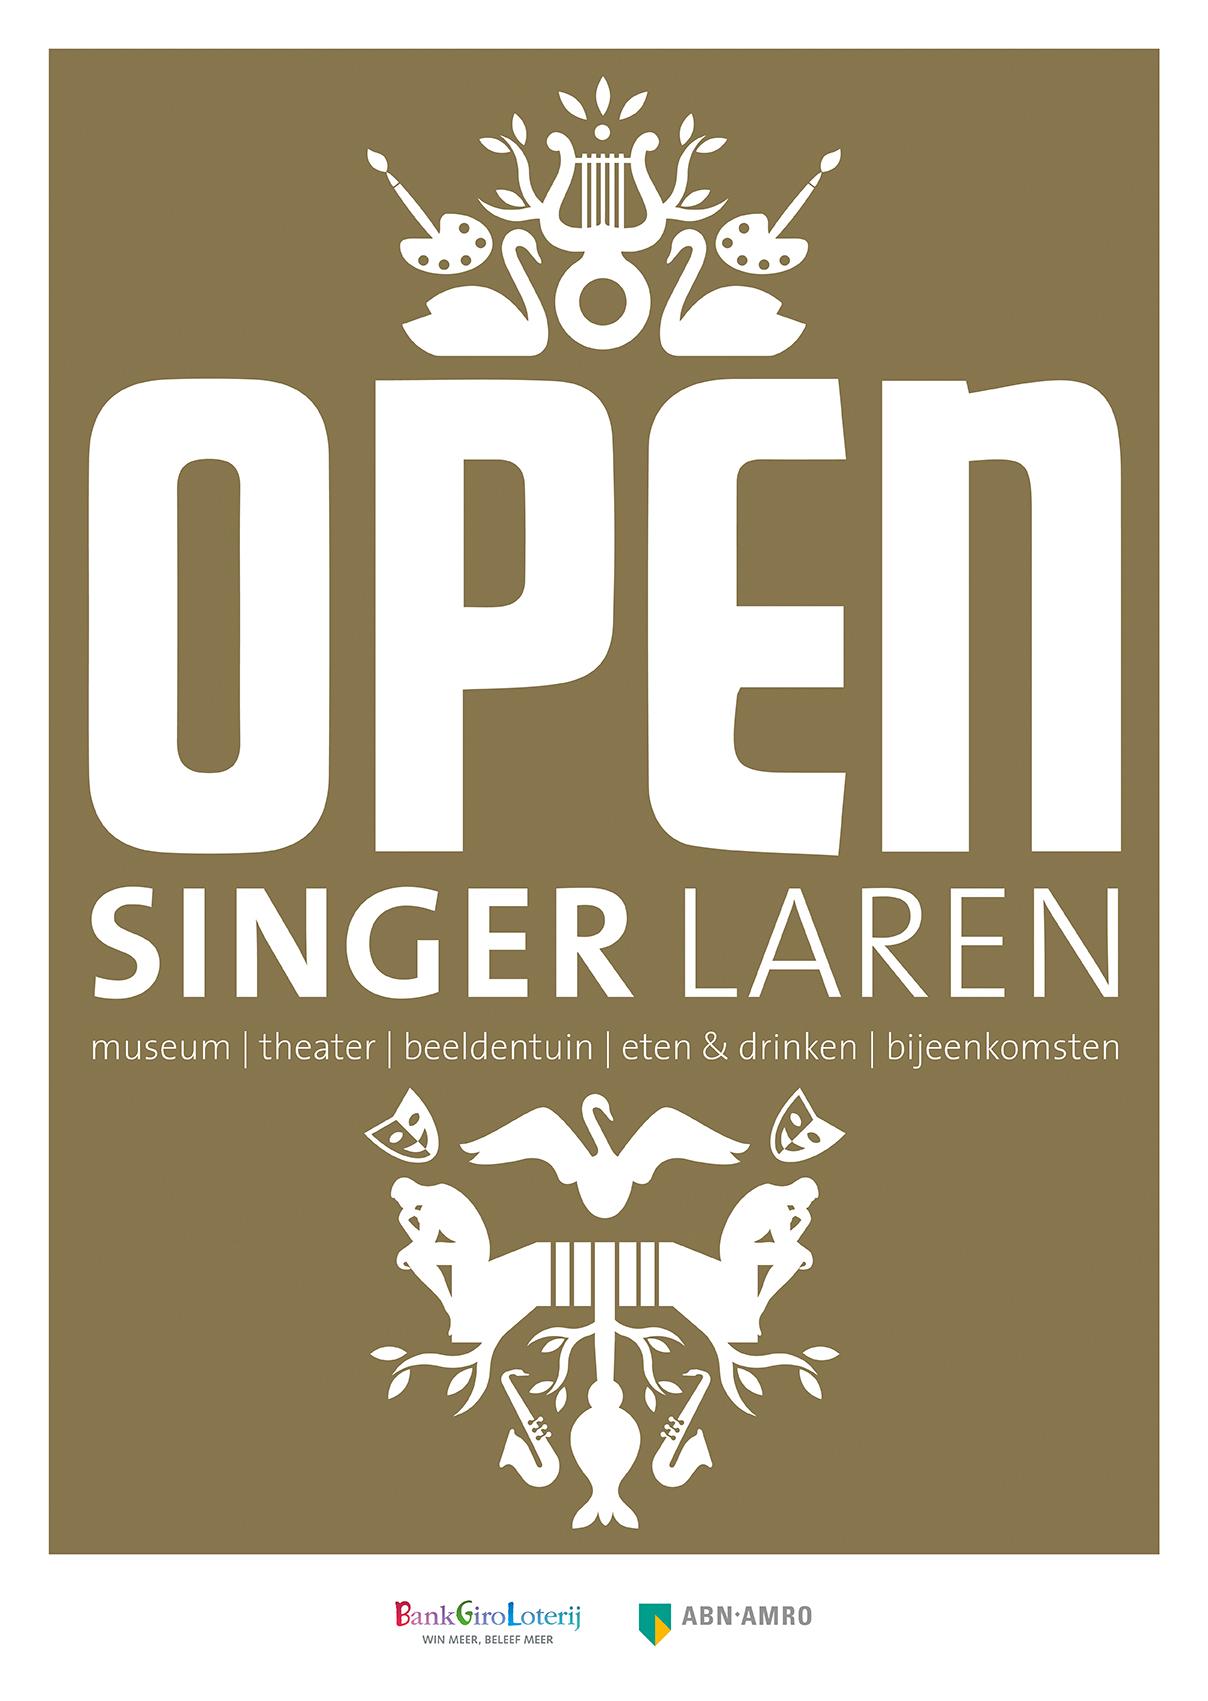 Singer Laren open